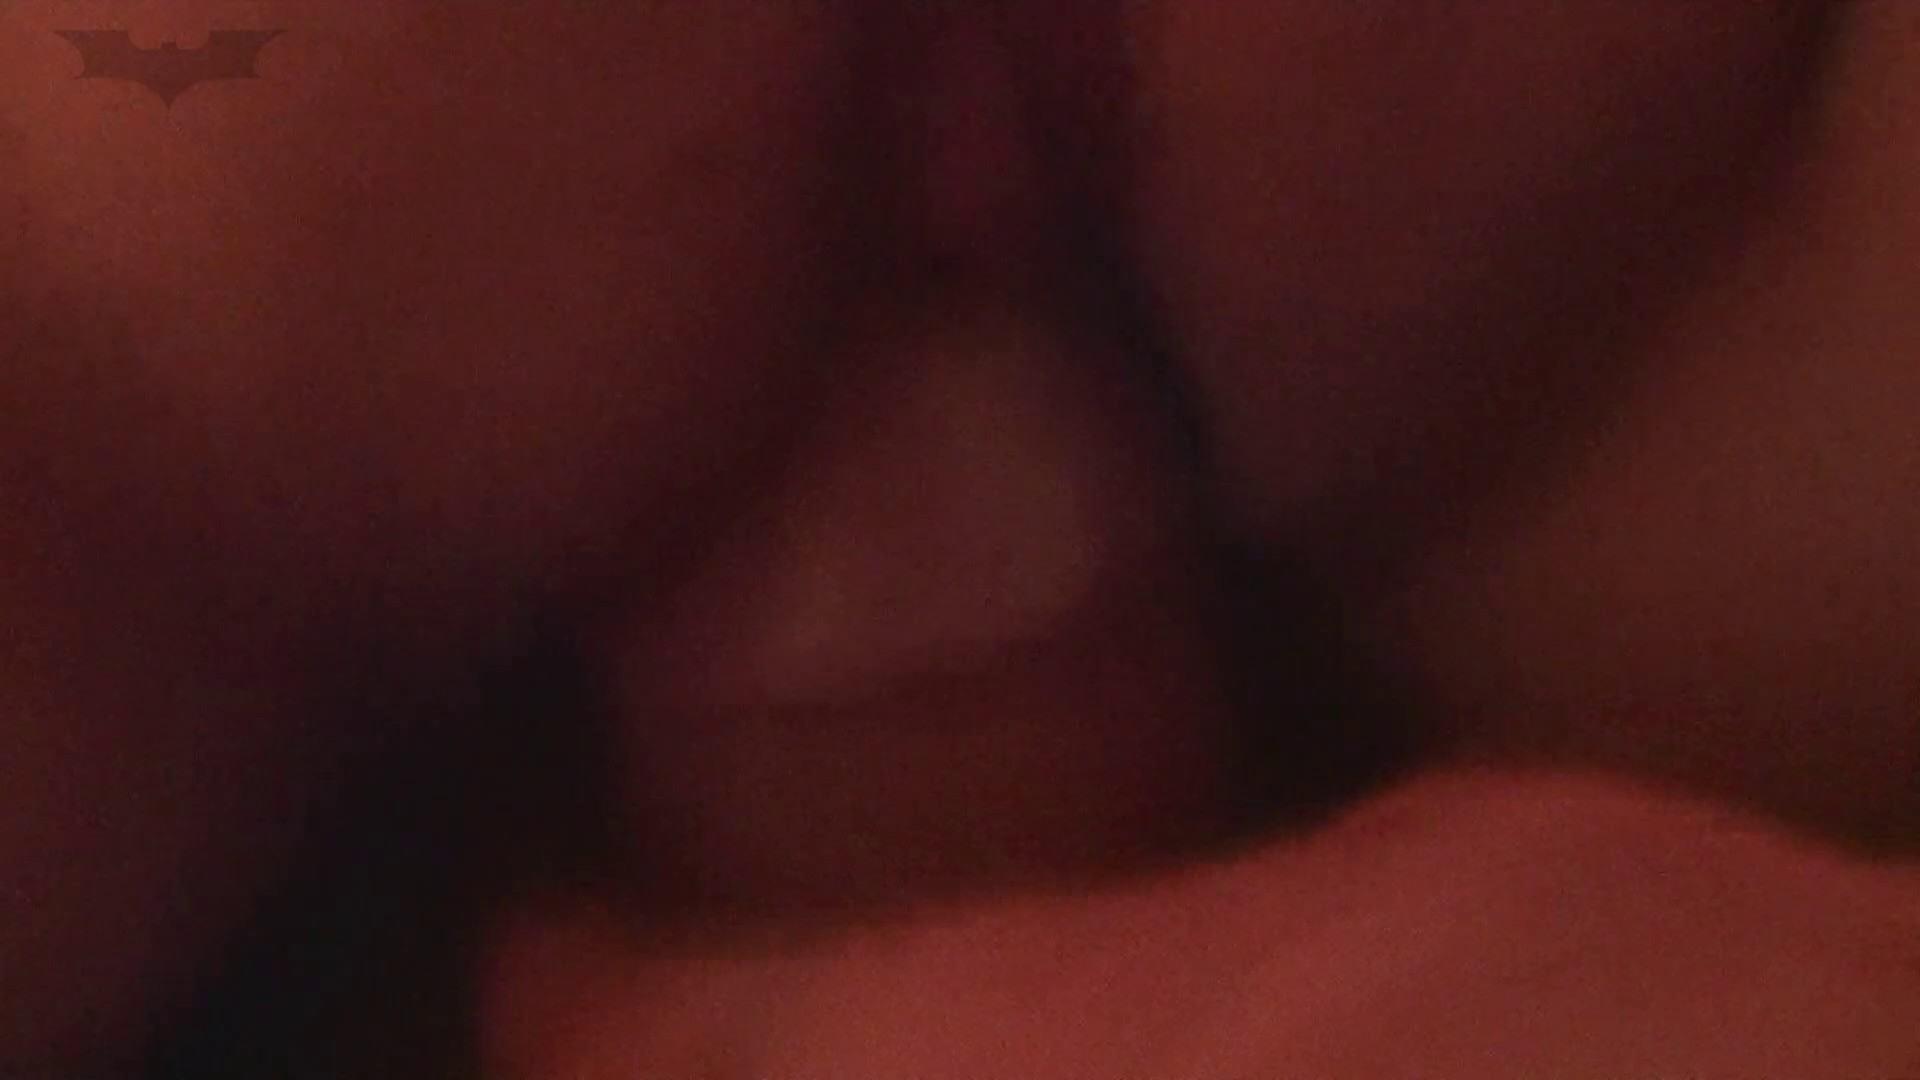 2日間期間限定闇の花道Vol.11影対姪っ子絶対ダメな調教関係Vol.05 高評価 戯れ無修正画像 33画像 7